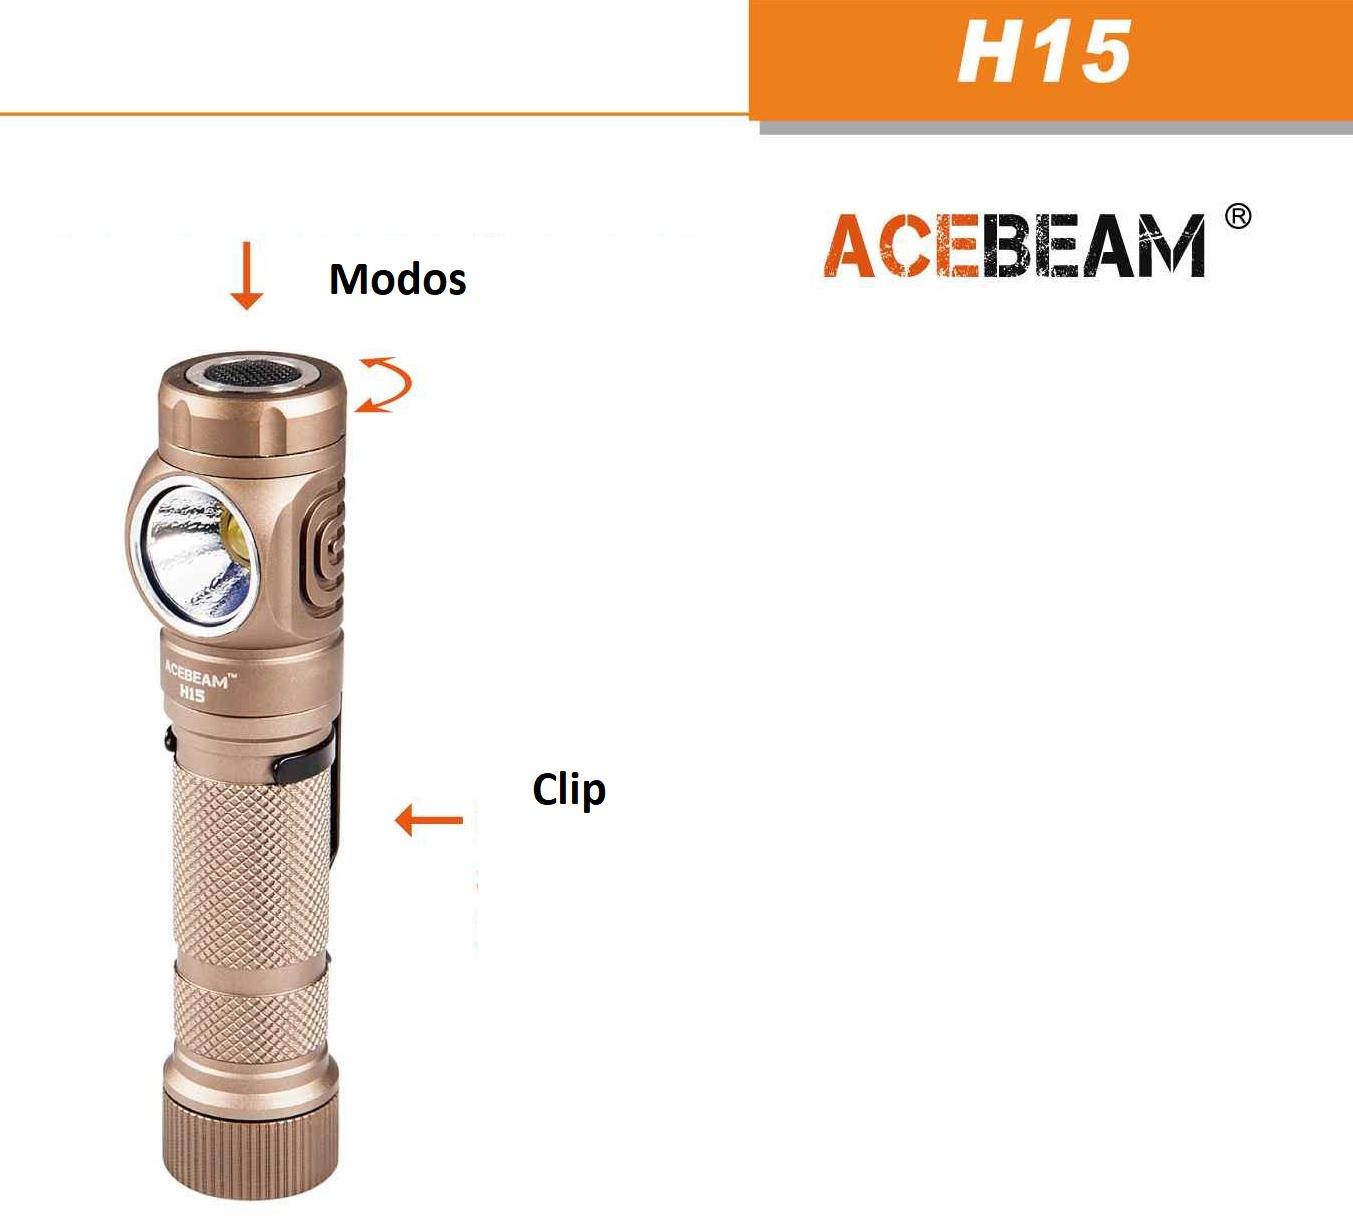 ACEBEAM H15 SANDY